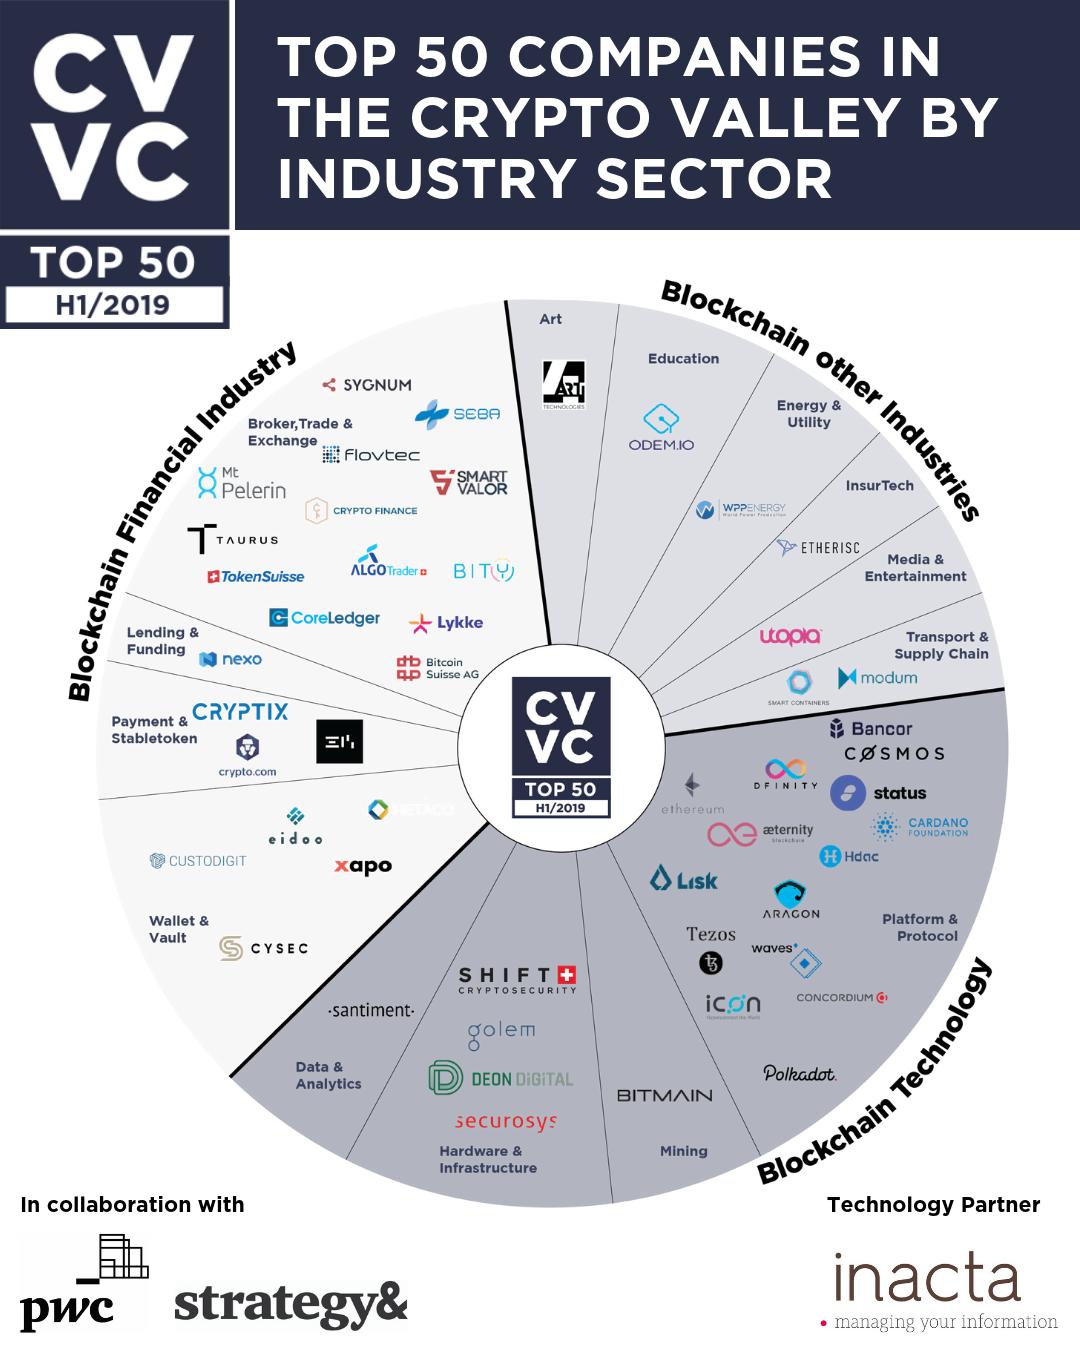 TOP 50 companies per sector